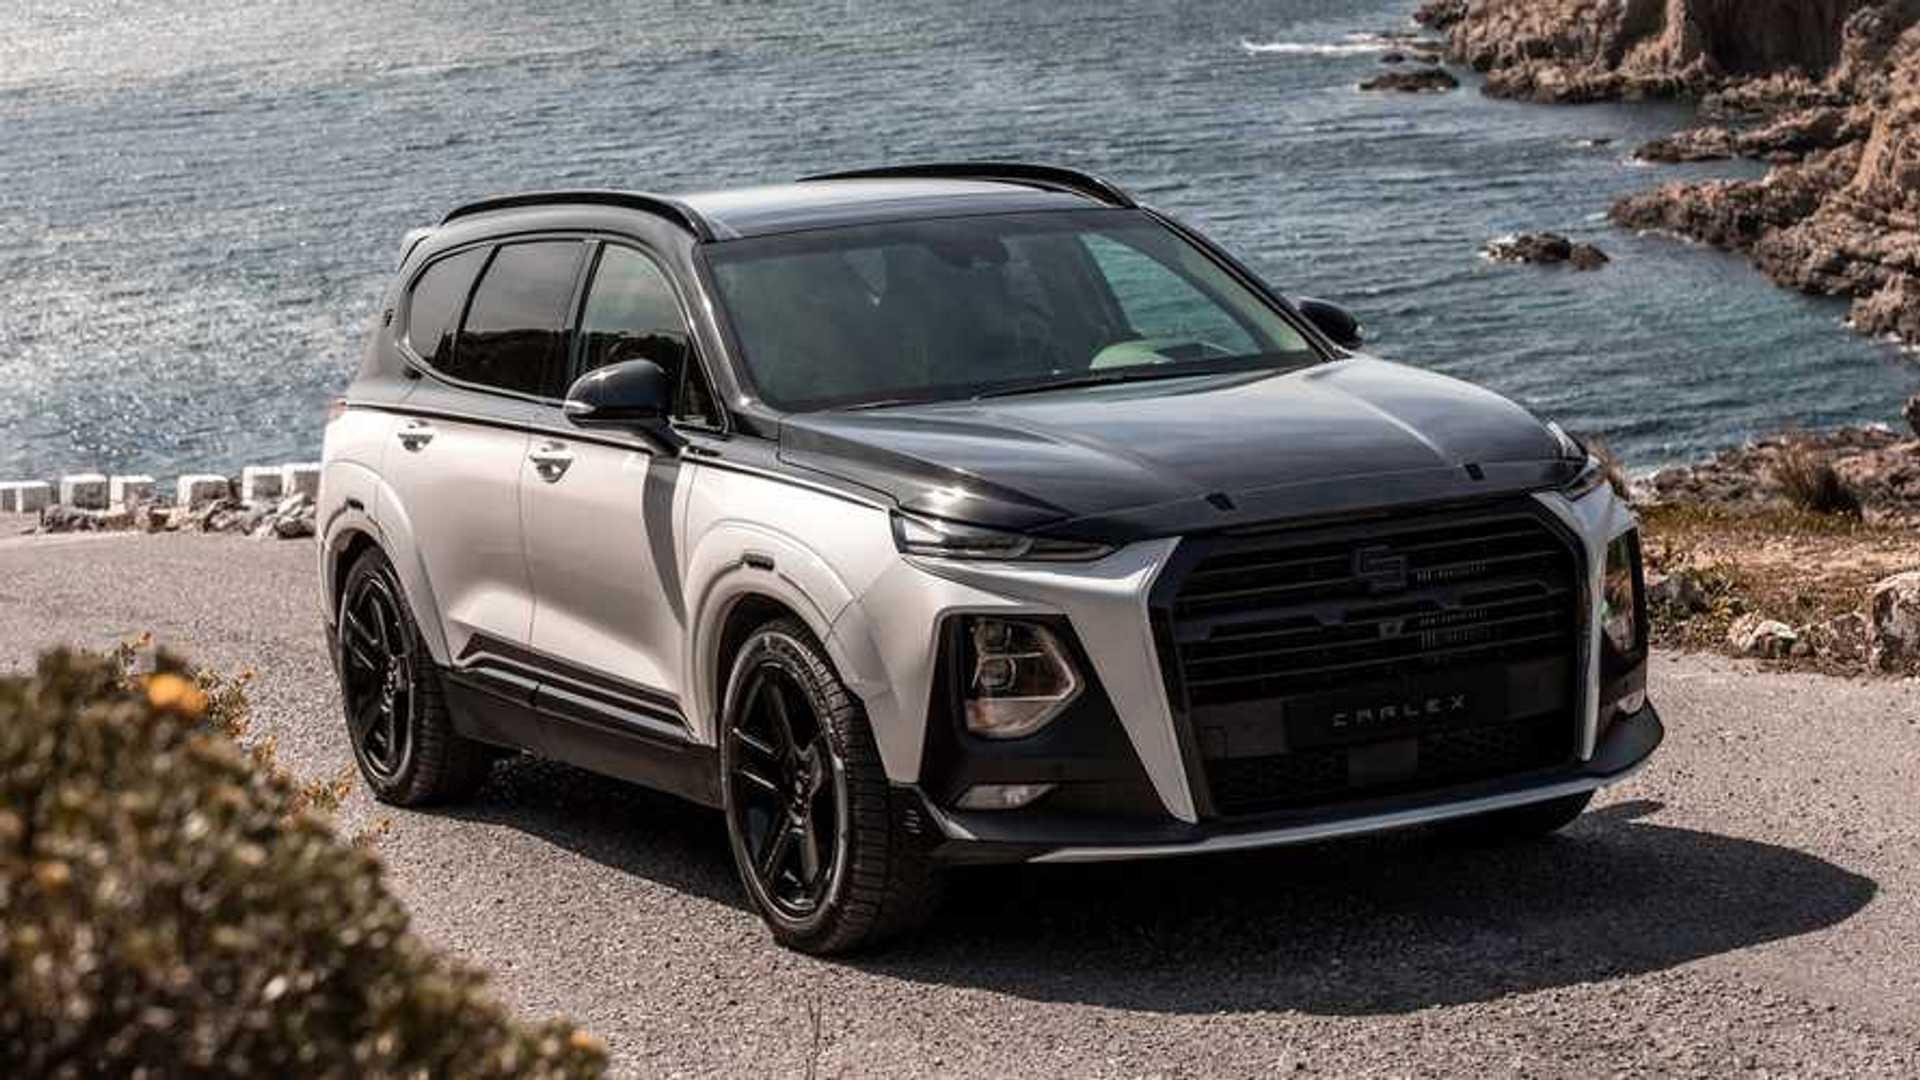 Hyundai Santa Fe Gets Radical Makeover From Carlex Design